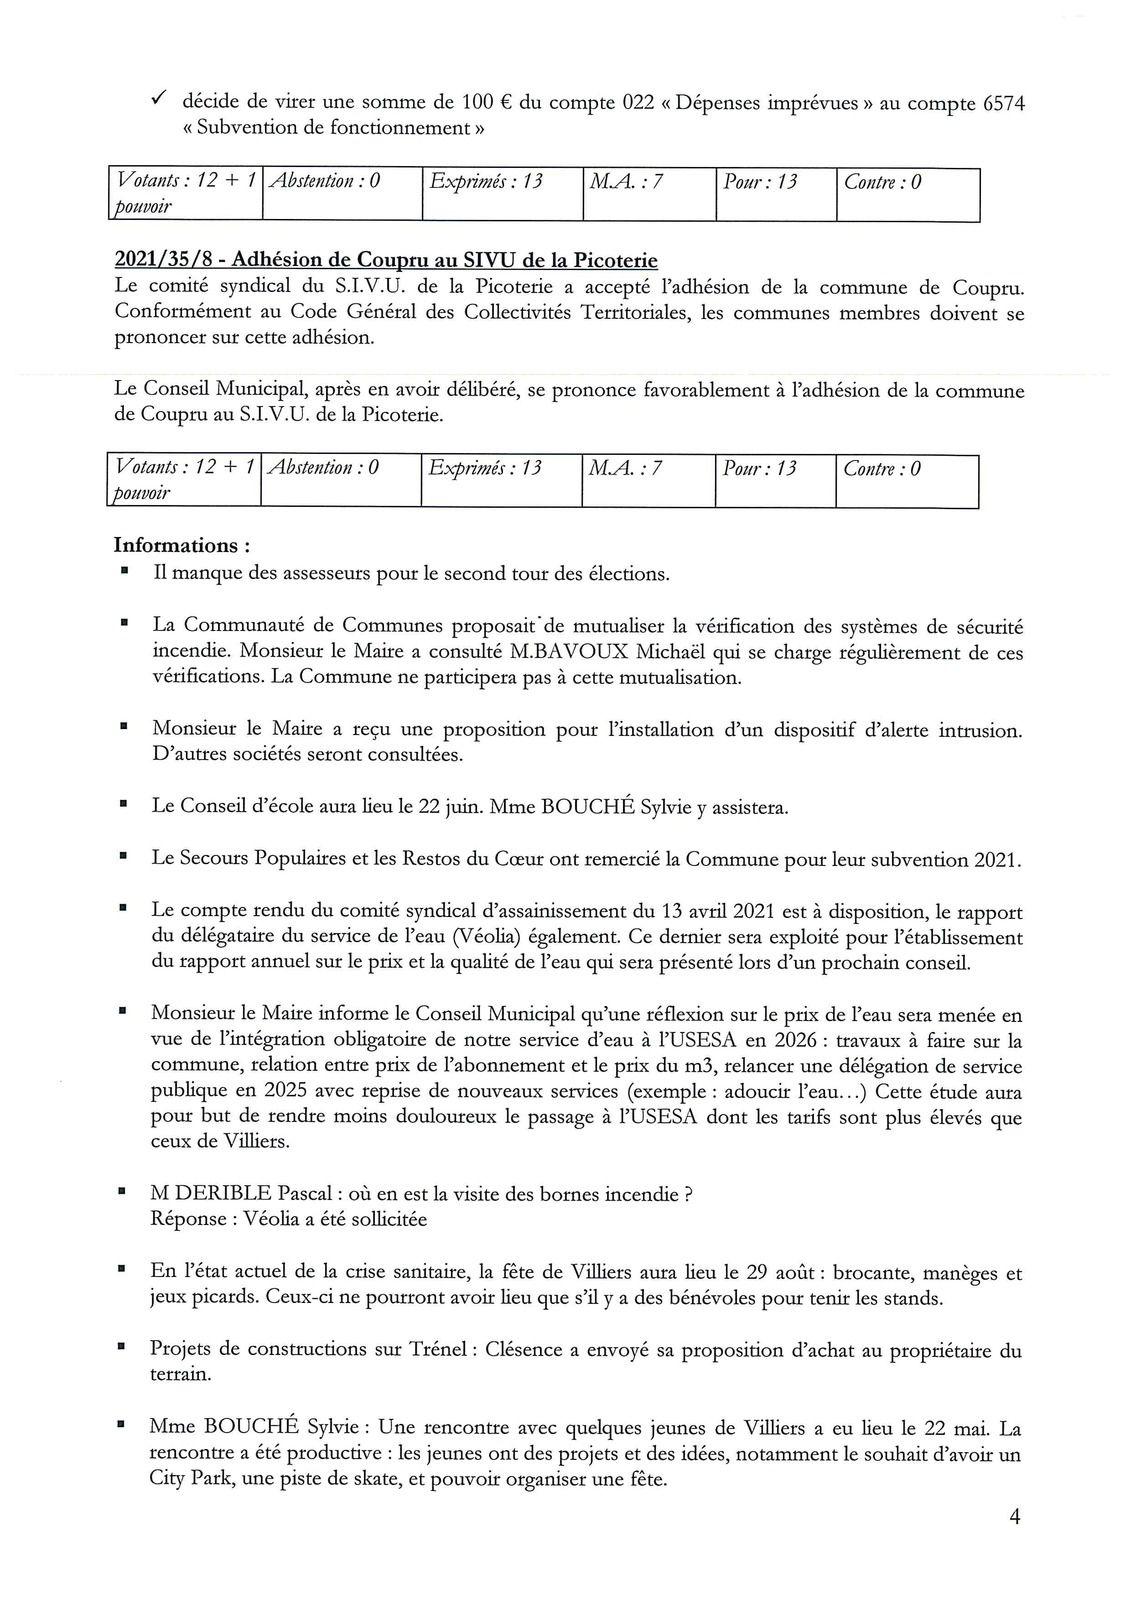 Compte rendu du Conseil Municipal - du 10 juin 2021